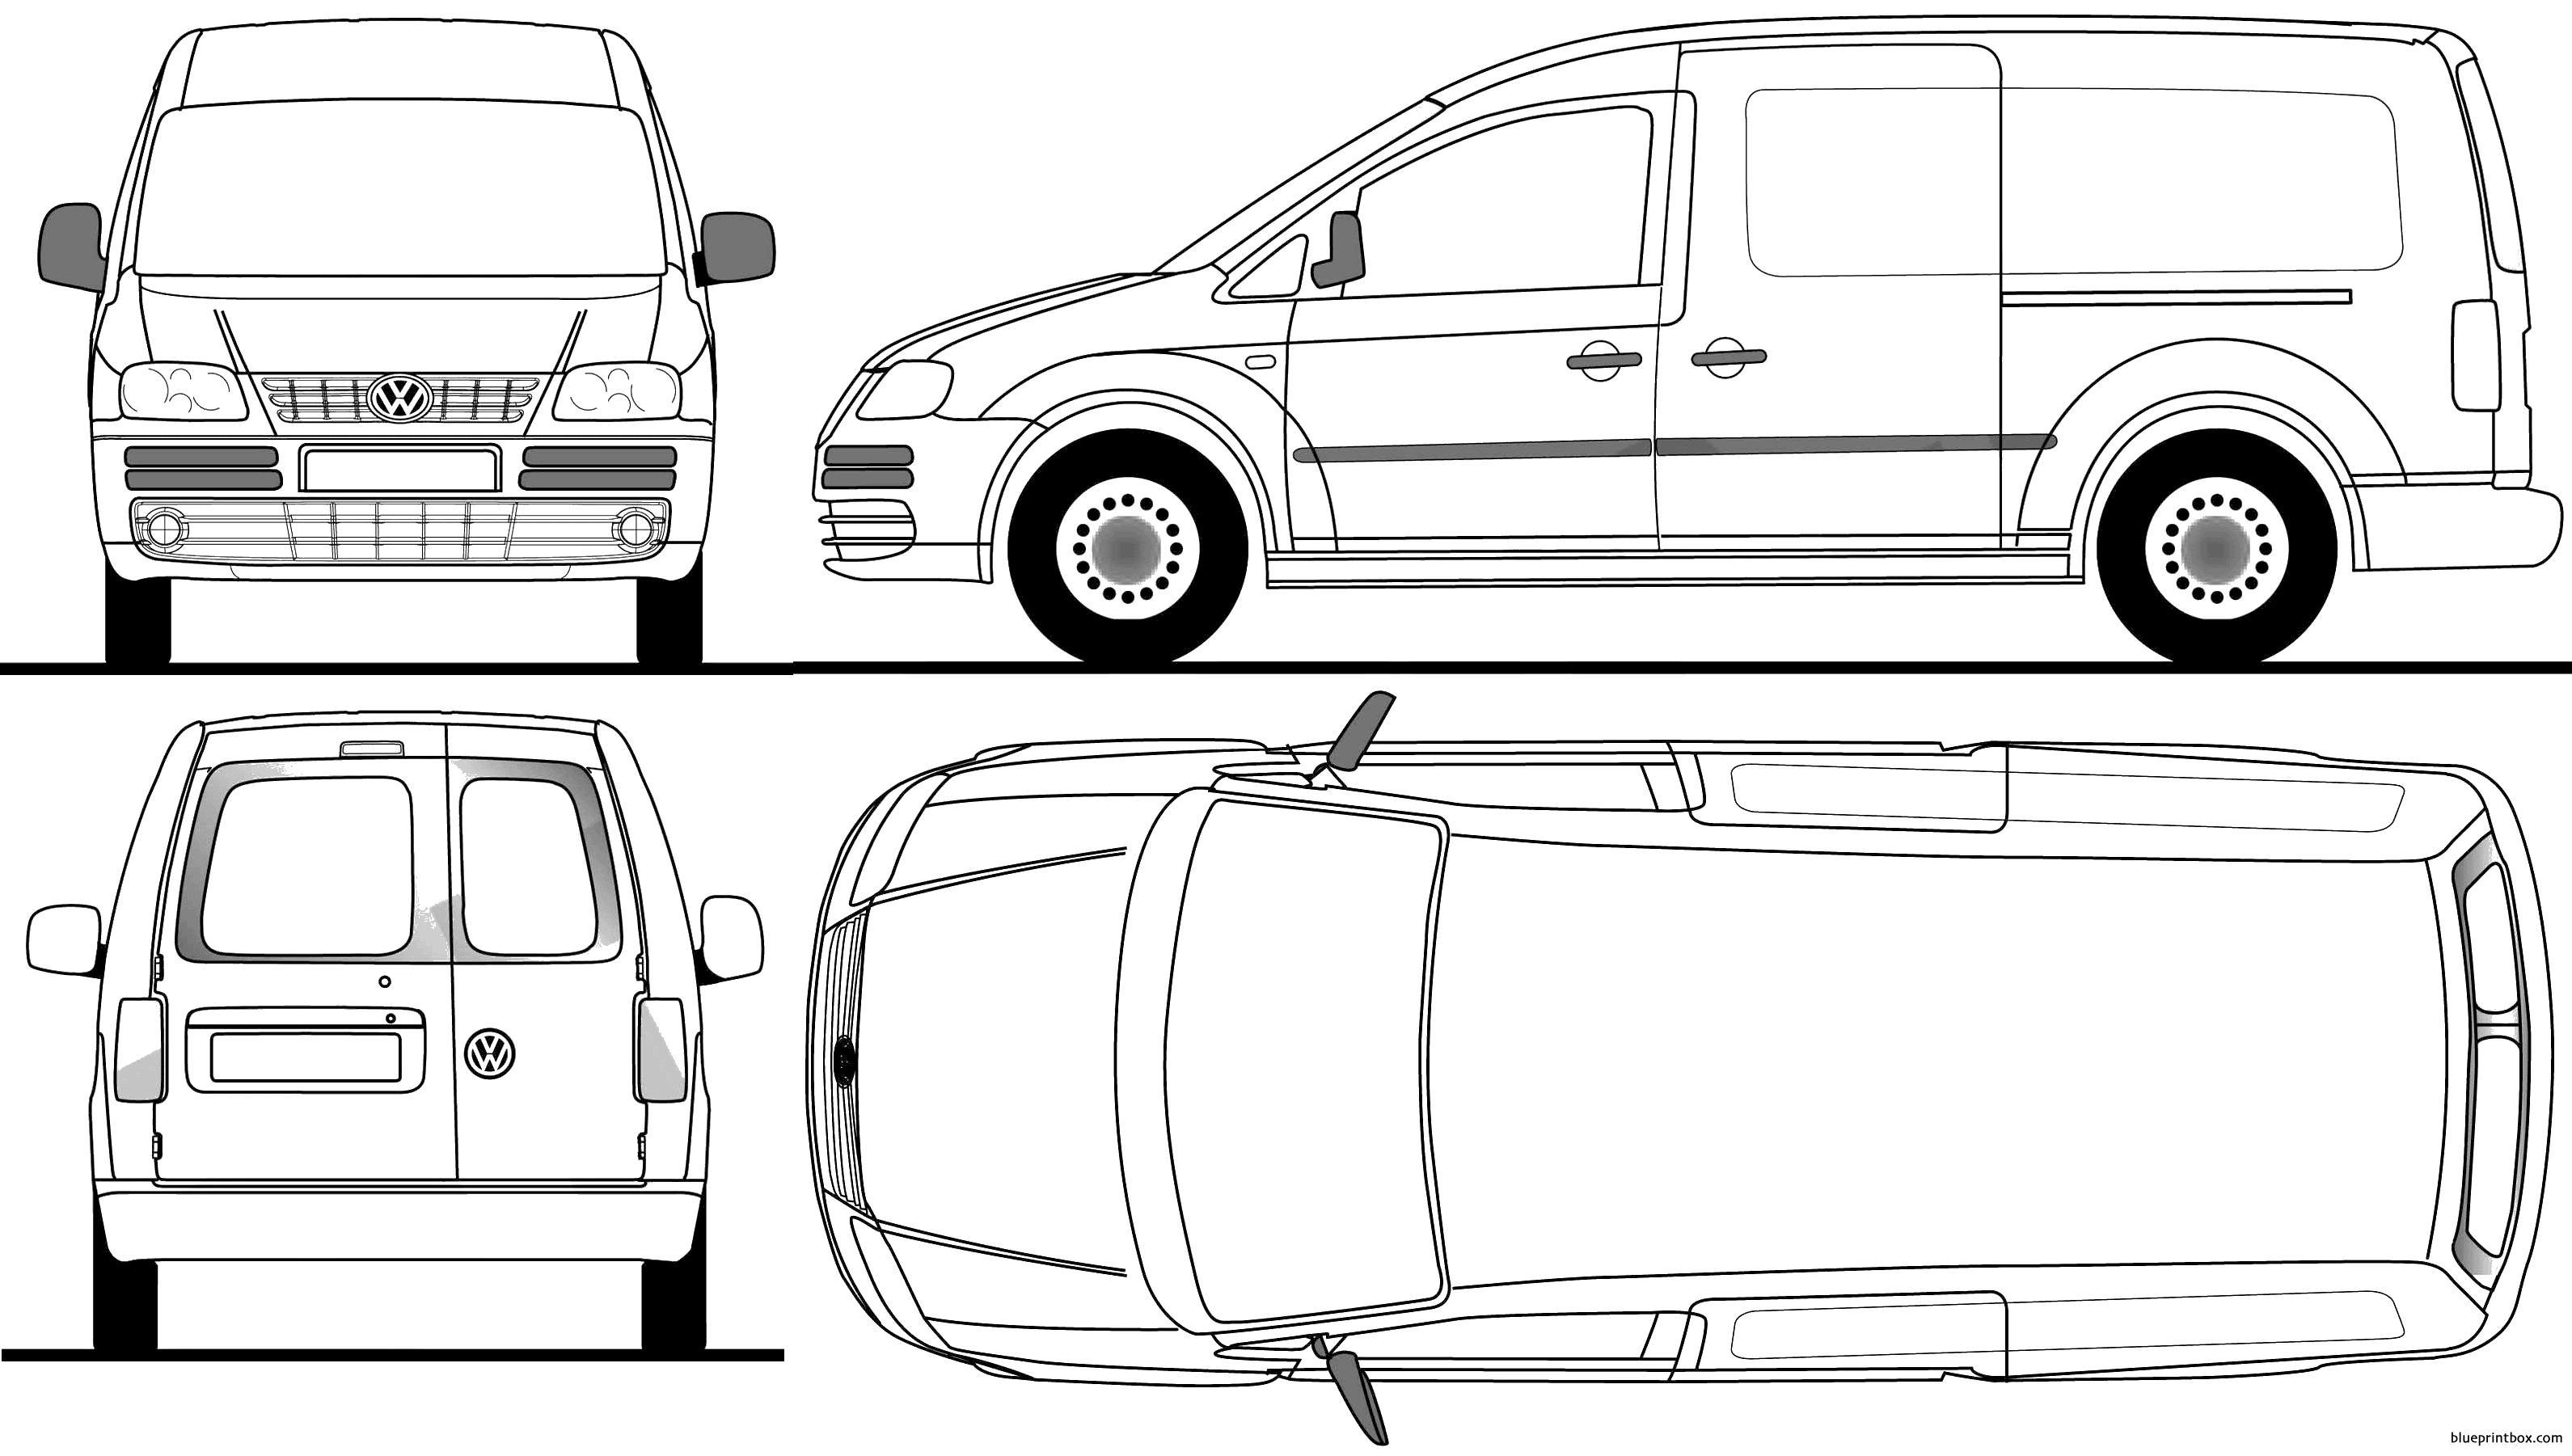 Volkswagen Caddy Lwb 2008 - Blueprintbox Com